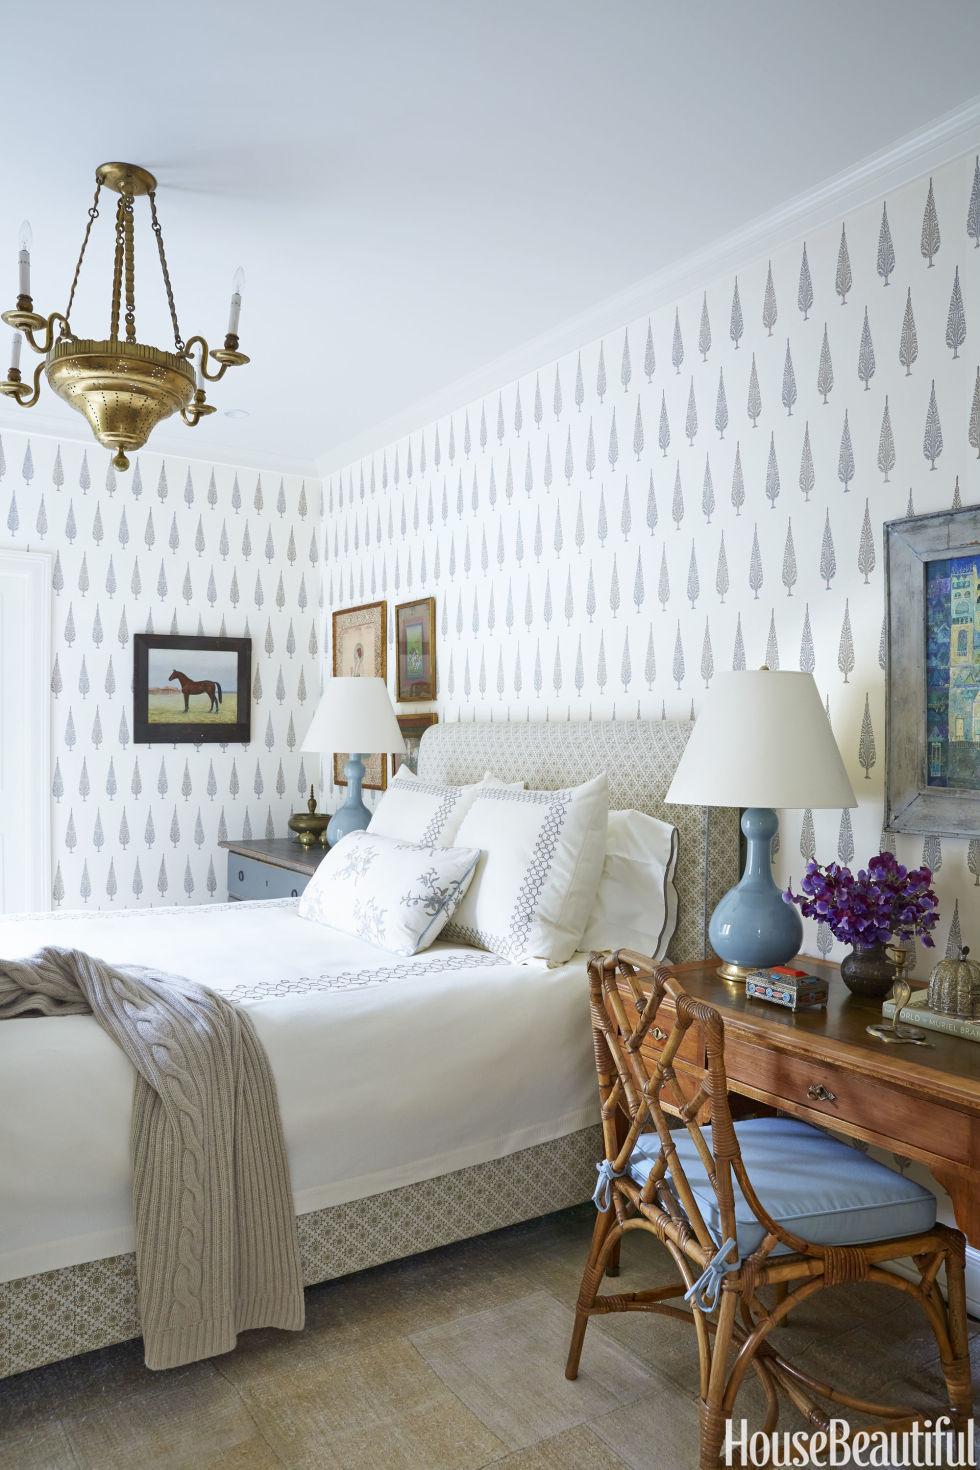 bedroom ideas 175 stylish bedroom decorating ideas - design pictures of beautiful modern  bedrooms ZPLQCXU